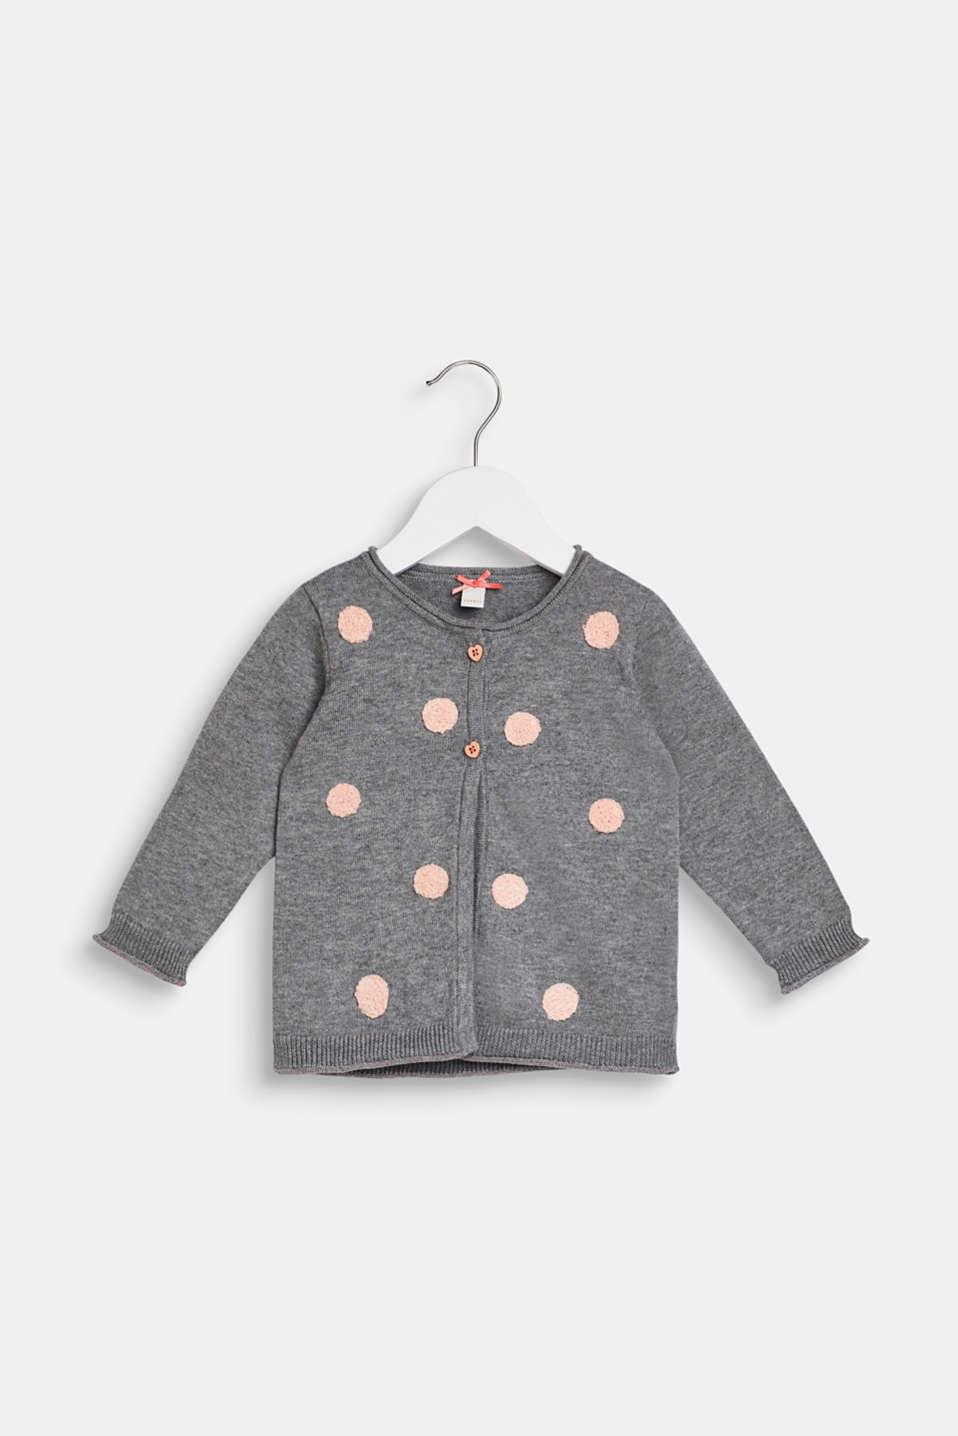 Polka dot-textured cardigan, 100% cotton, LCDARK HEATHER G, detail image number 0